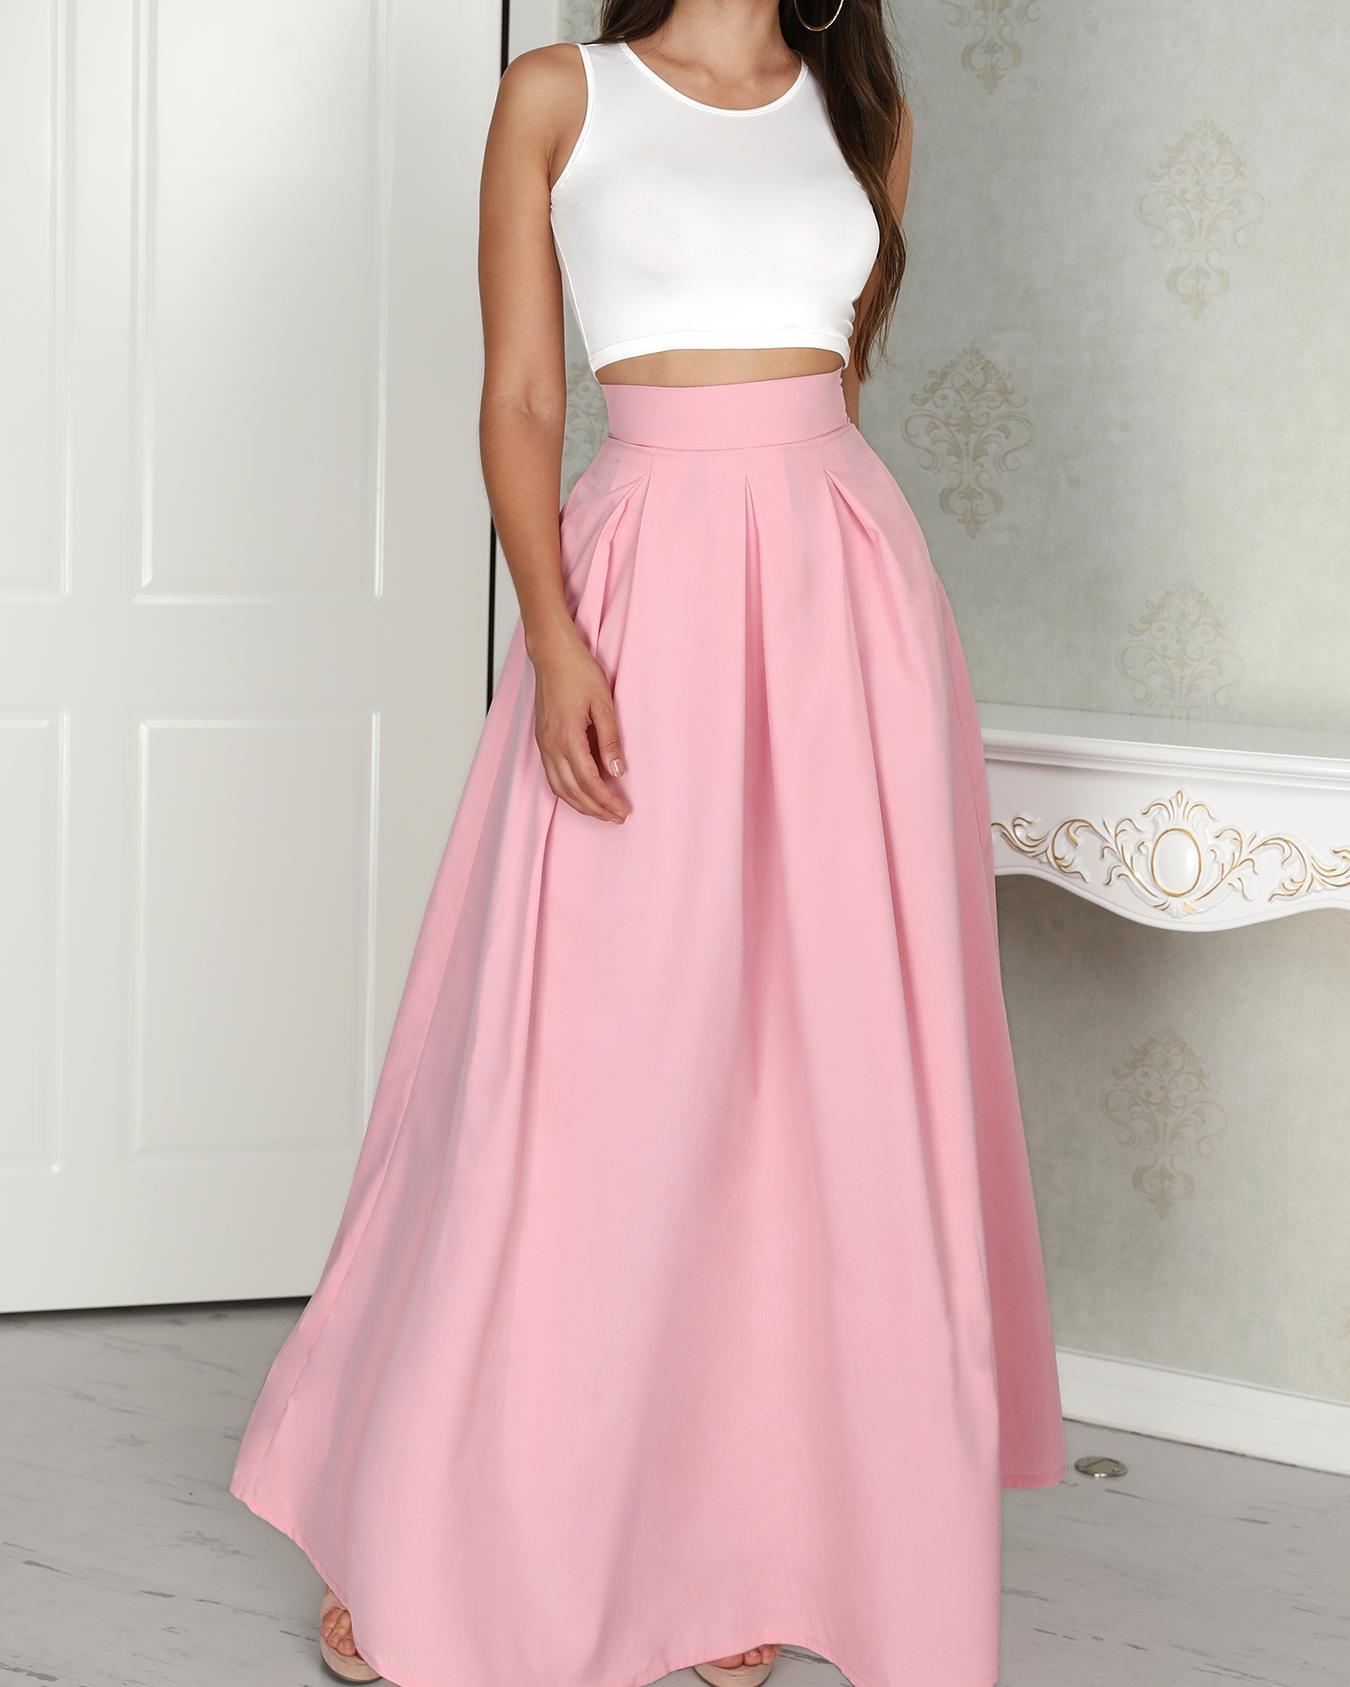 2 Pc Sleeveless Blouse and Culotte Skirt Set